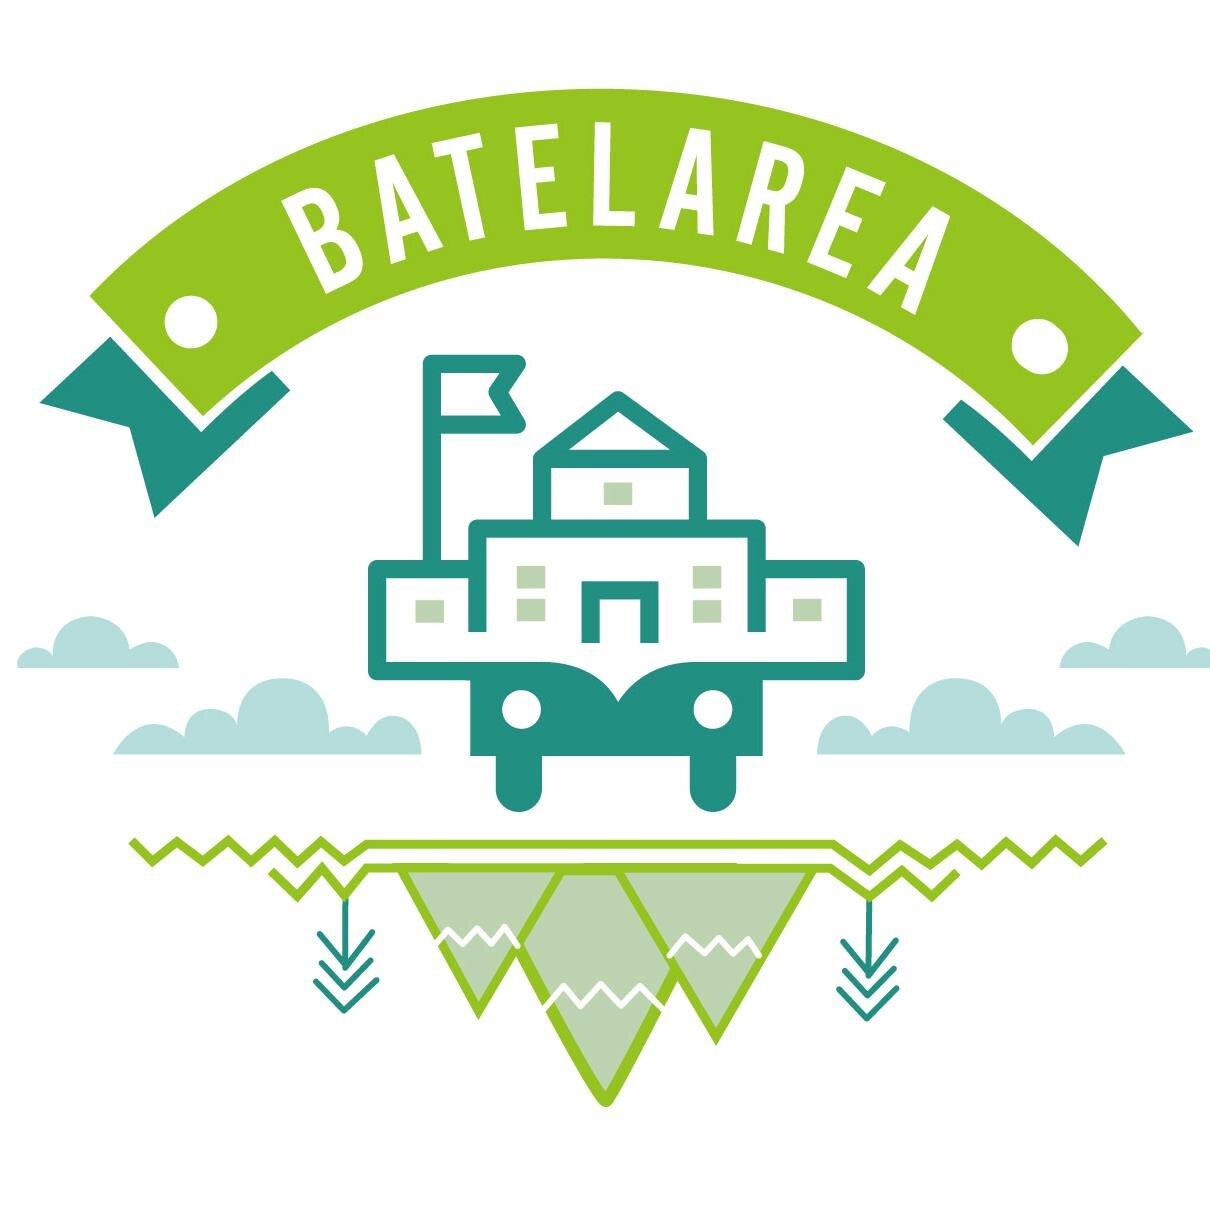 Autocaravanas Batelarea